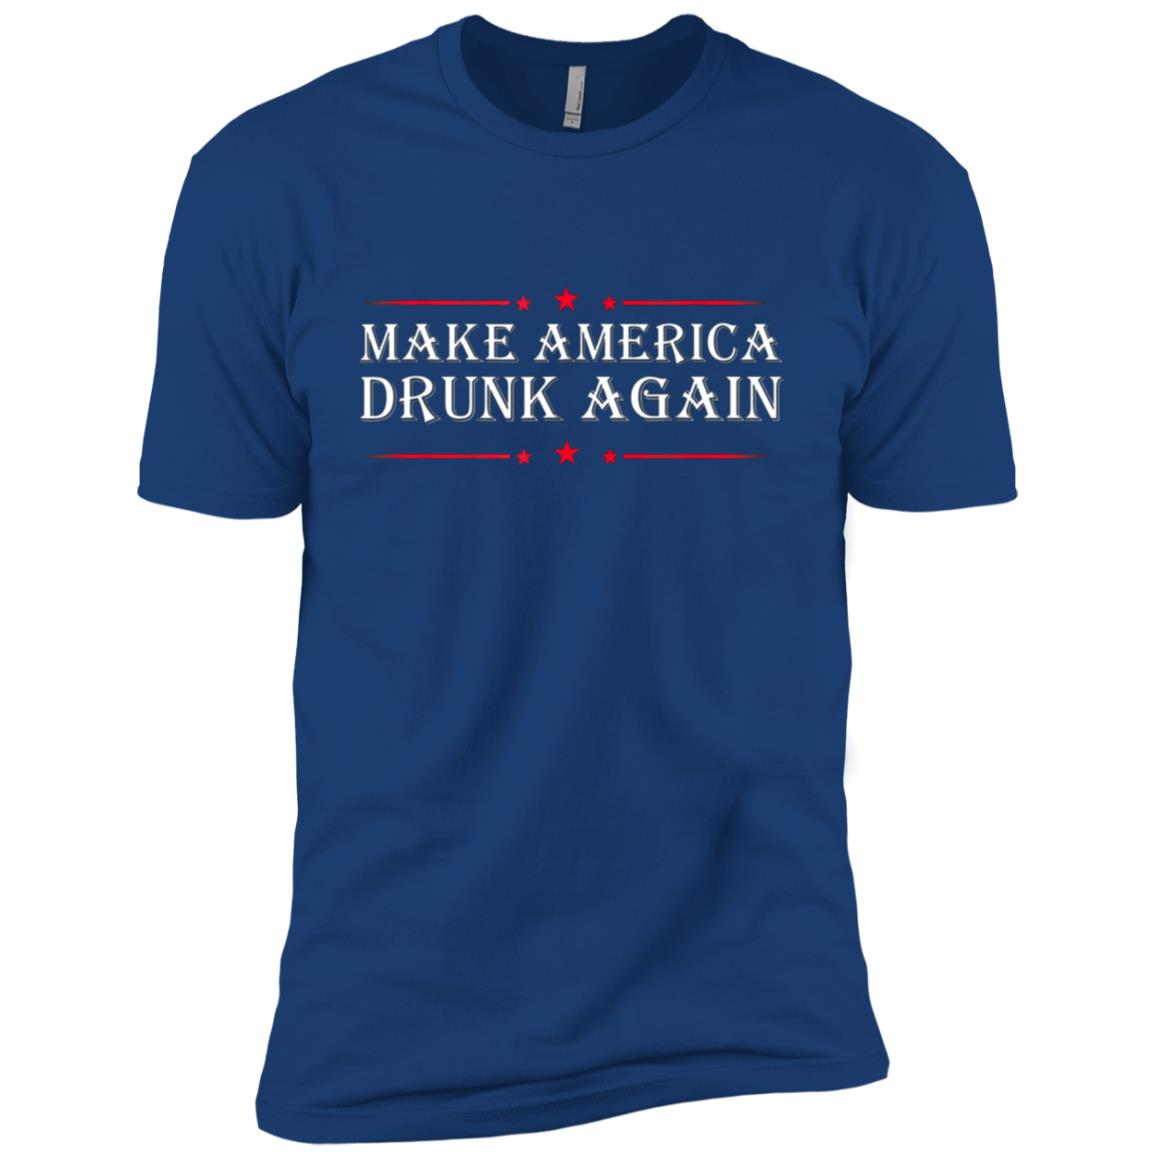 Make America Drunk Again Funny Sarcastic Sarcasm Alcohol Tee Men Short Sleeve T-Shirt